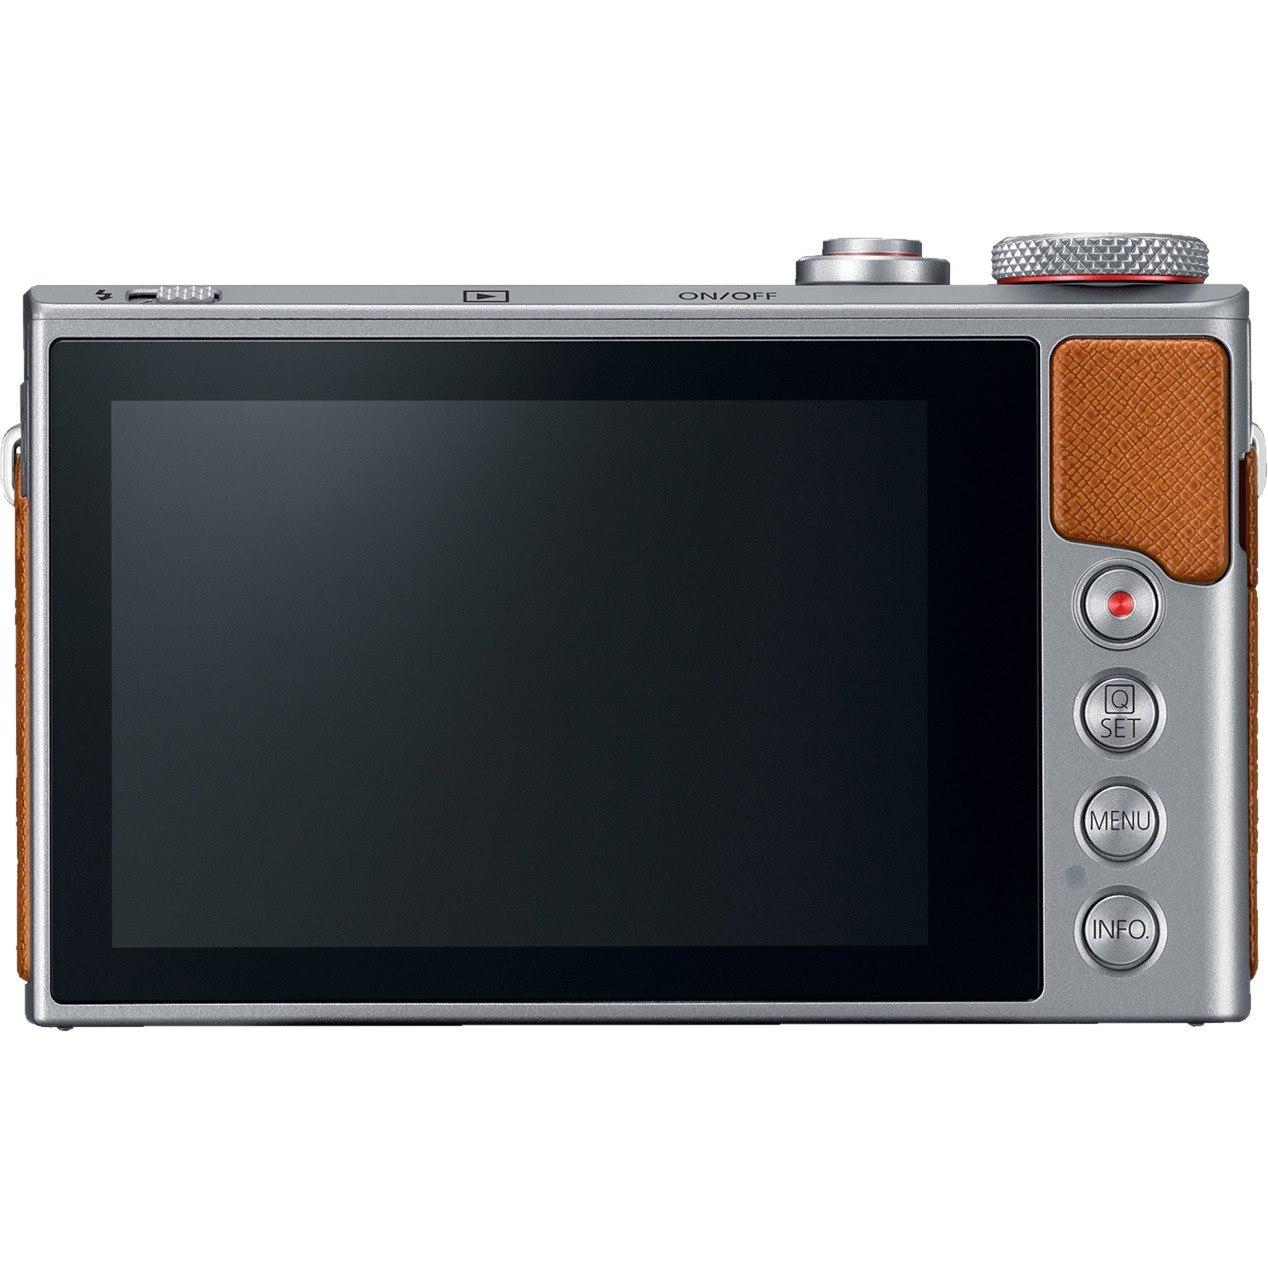 Canon PowerShot G9 X Mark II 20.1 Megapixel Compact Camera - Silver